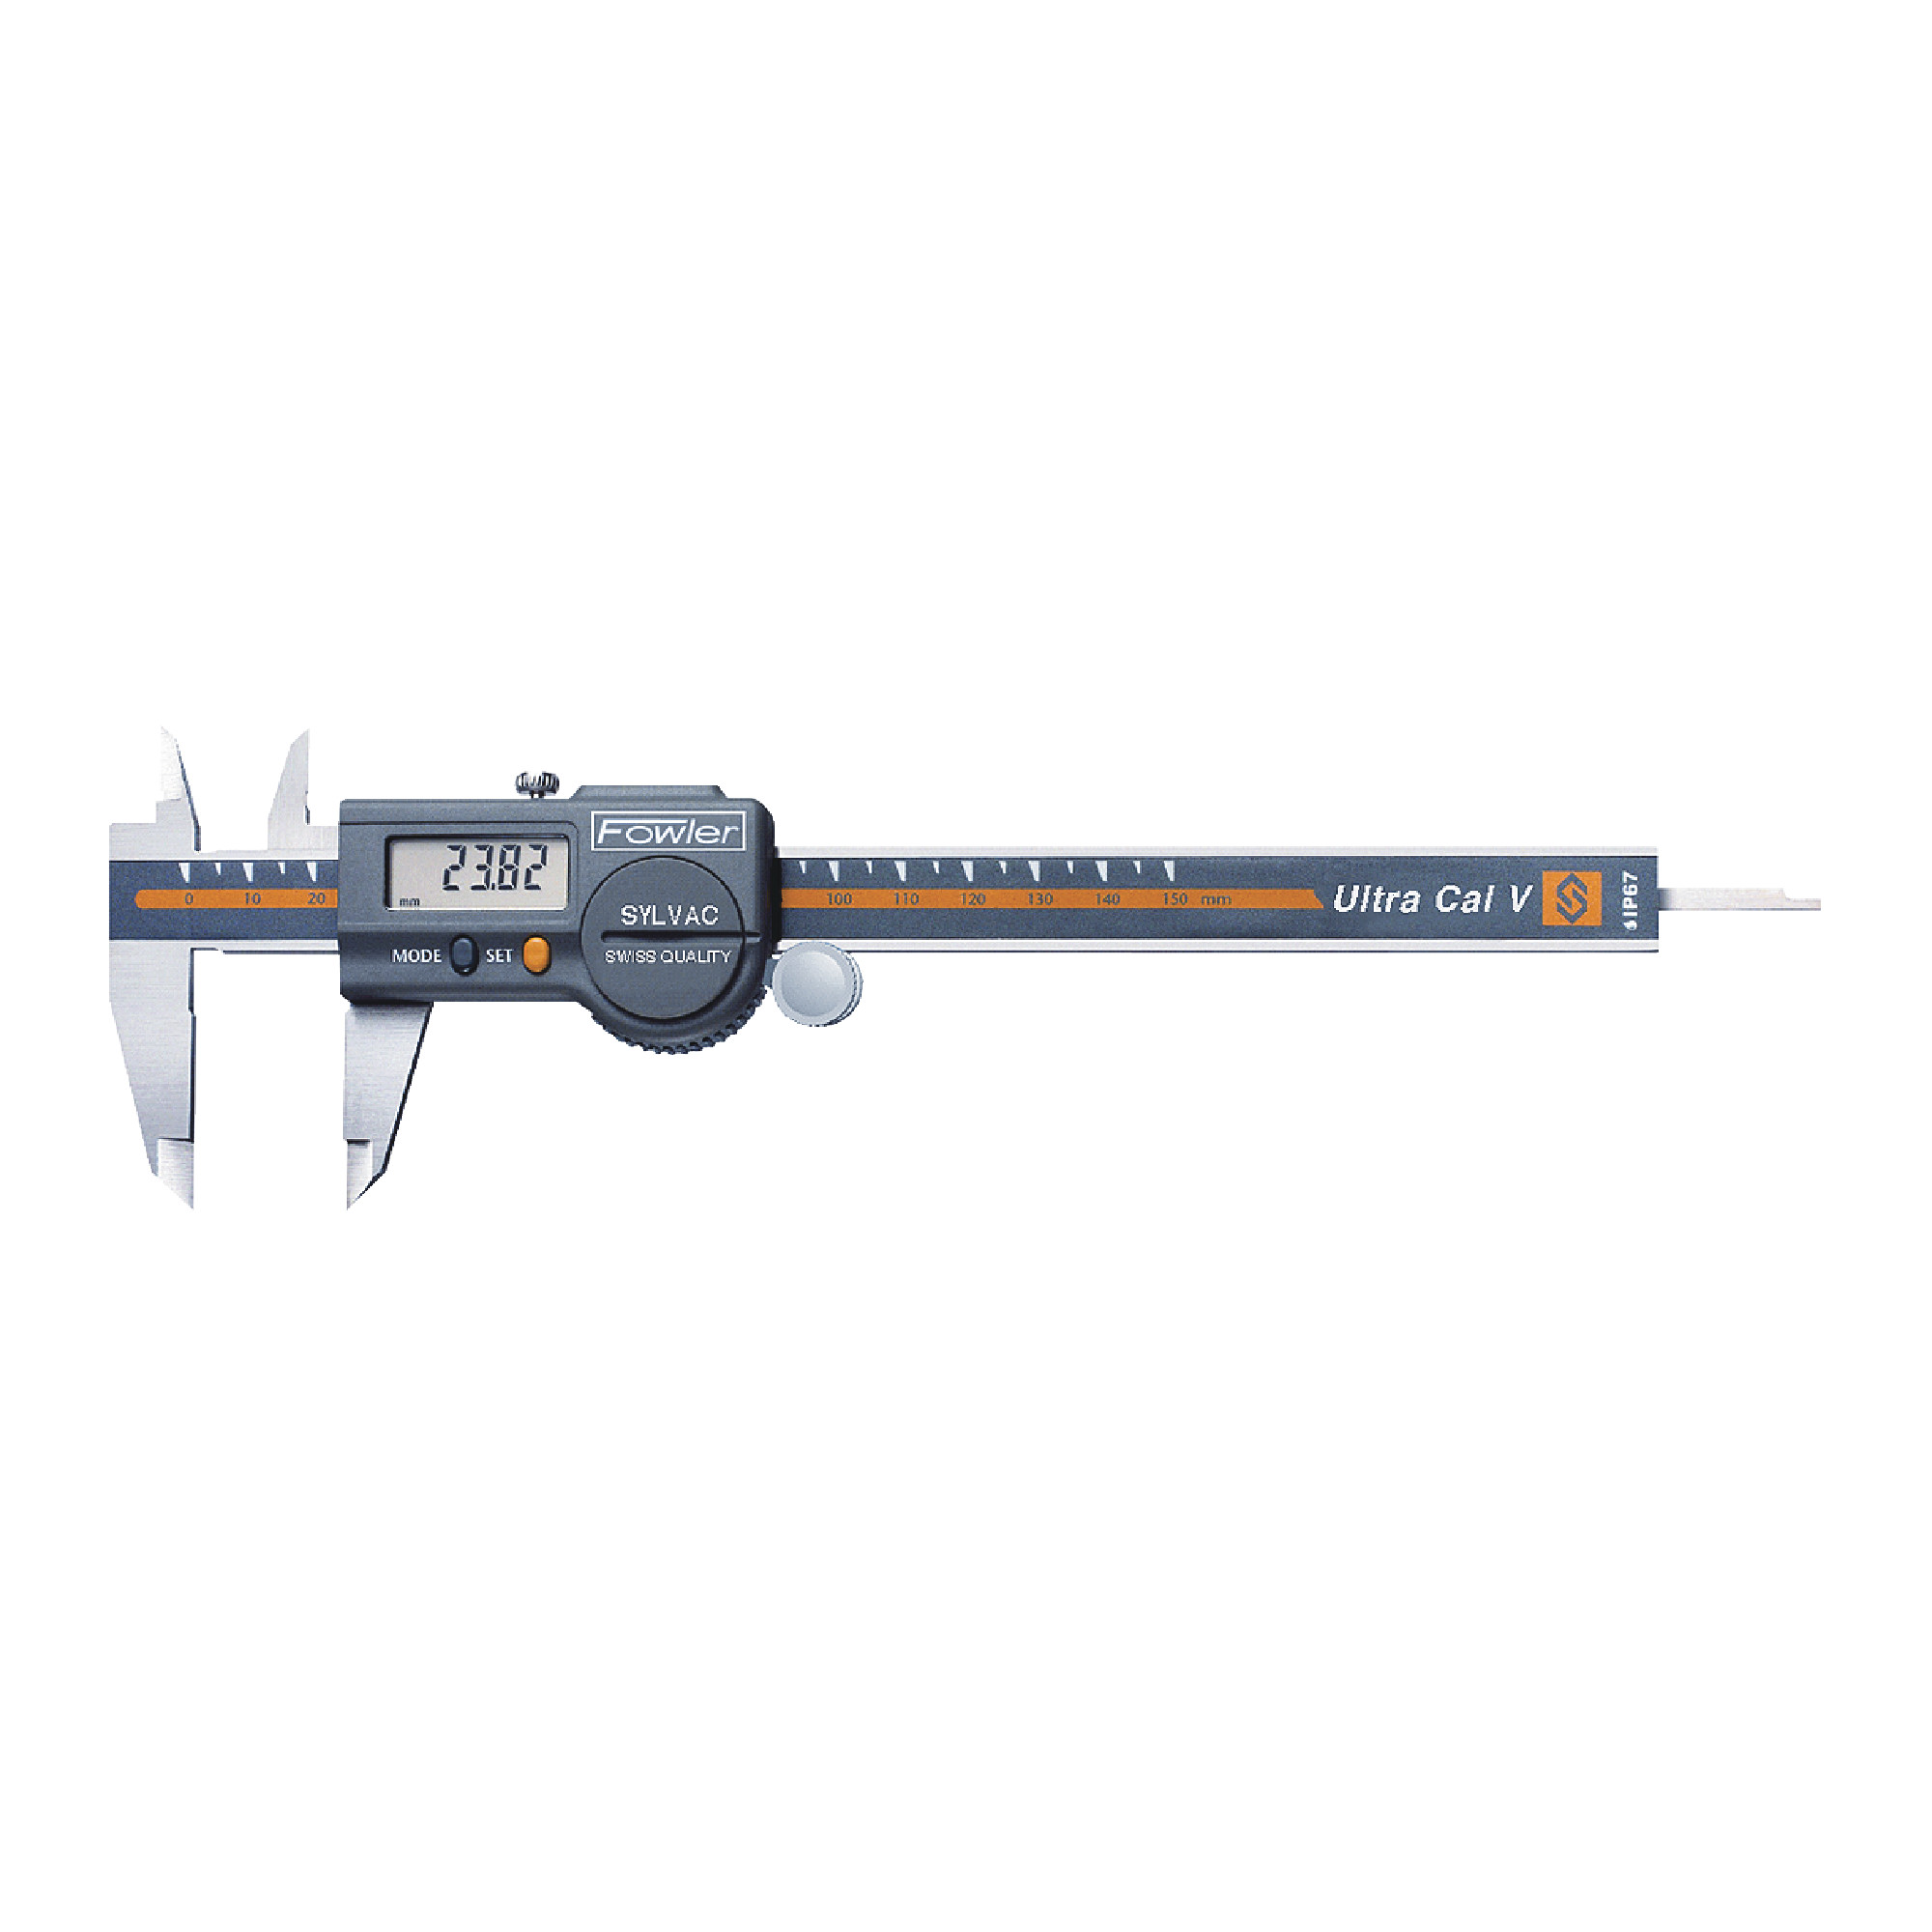 IP67 Ultra-Cal V Electronic Caliper